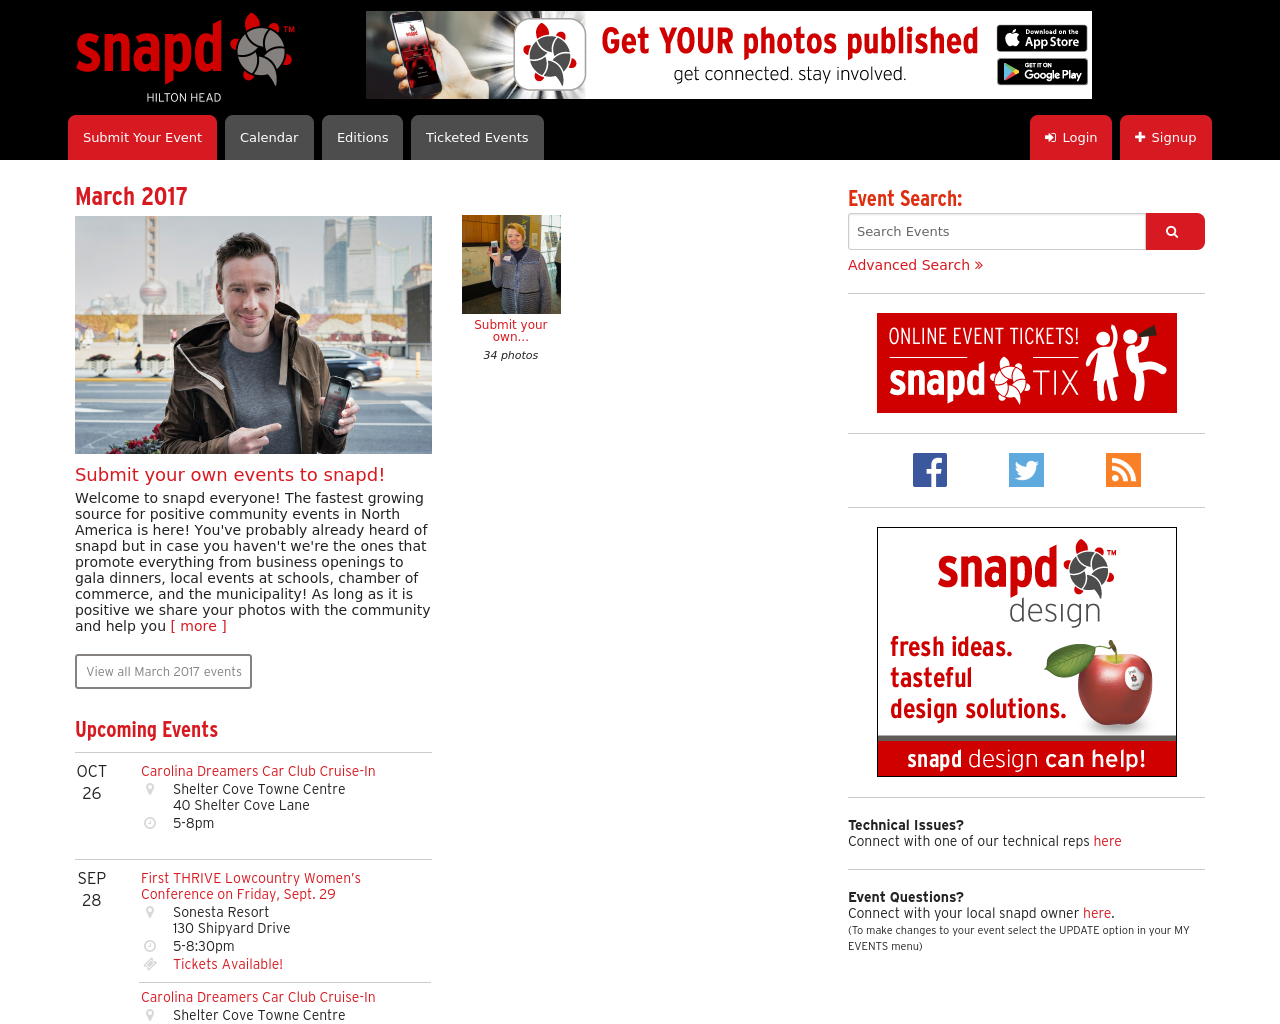 SNAP-Hilton-Head-Advertising-Reviews-Pricing